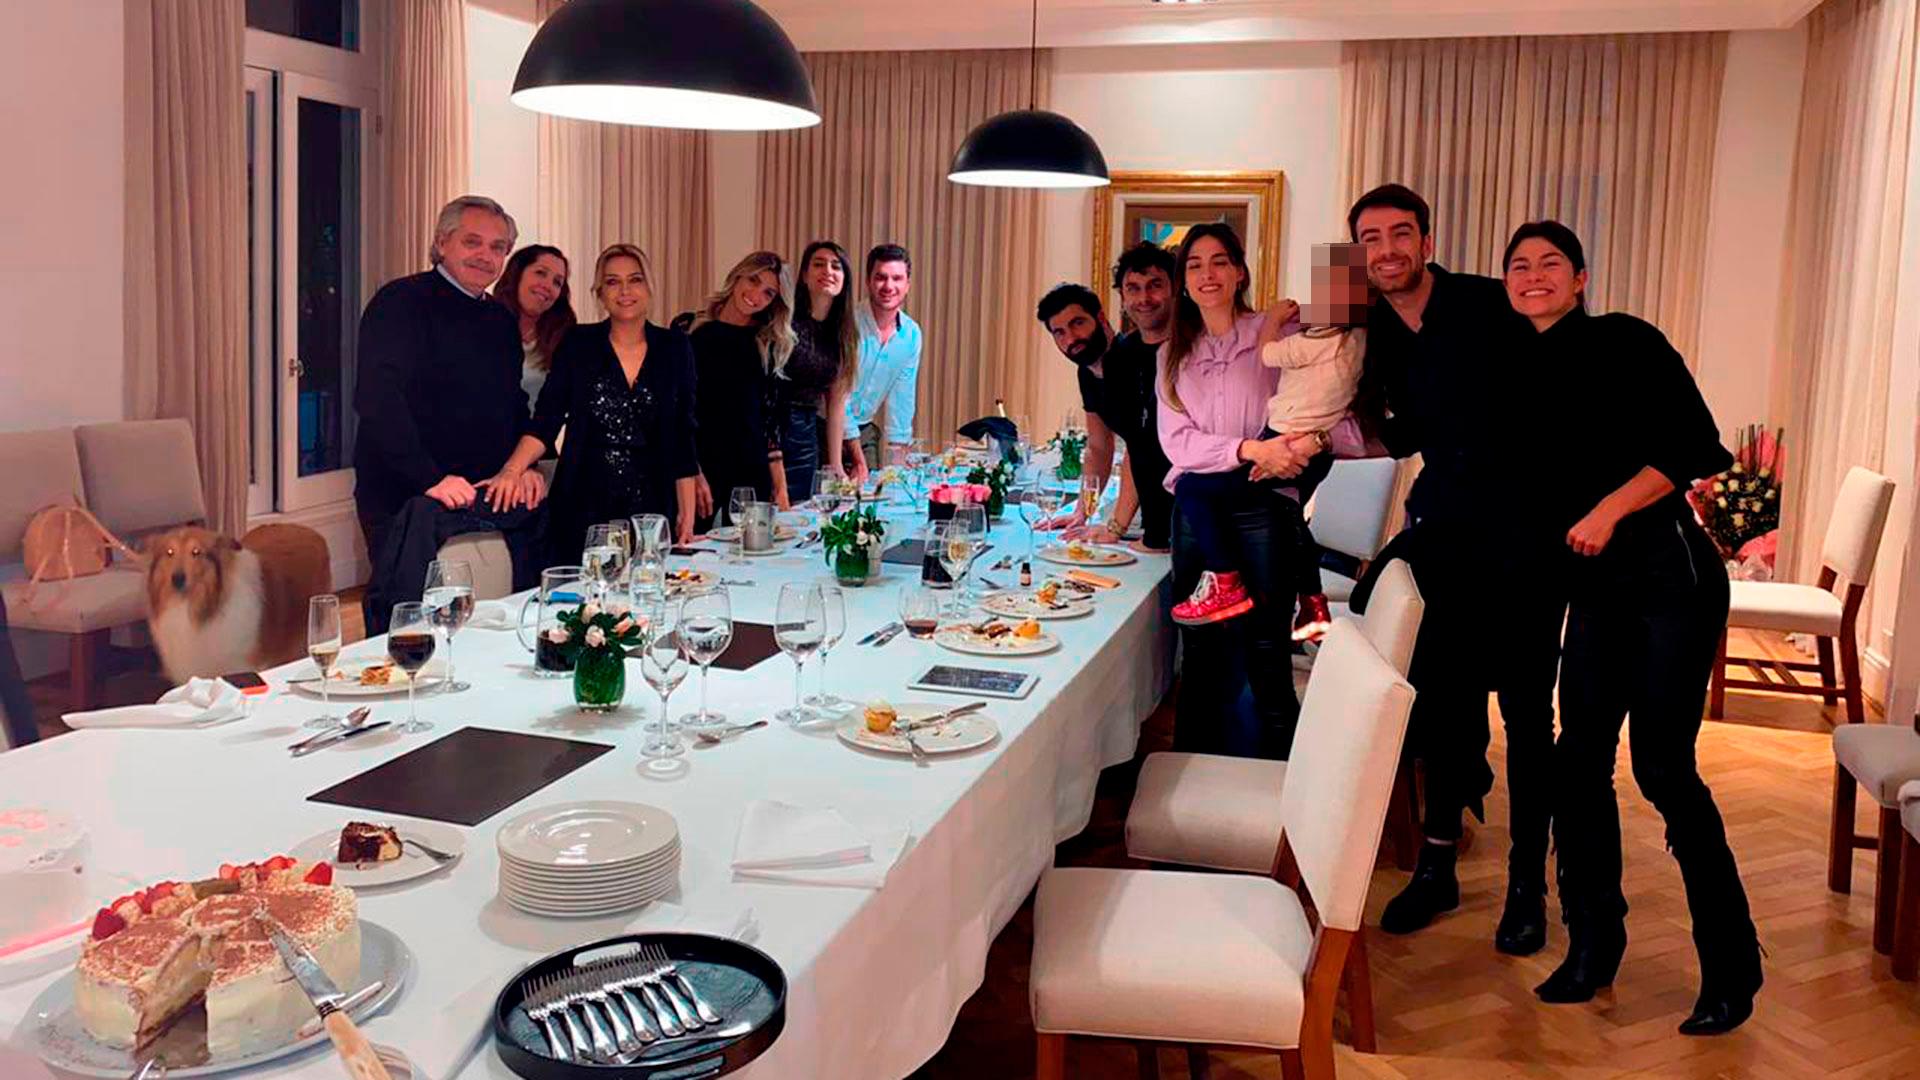 Sigue la polémica: mas fotos del cumpleaños de Fabiola Yáñez en plena cuarentena